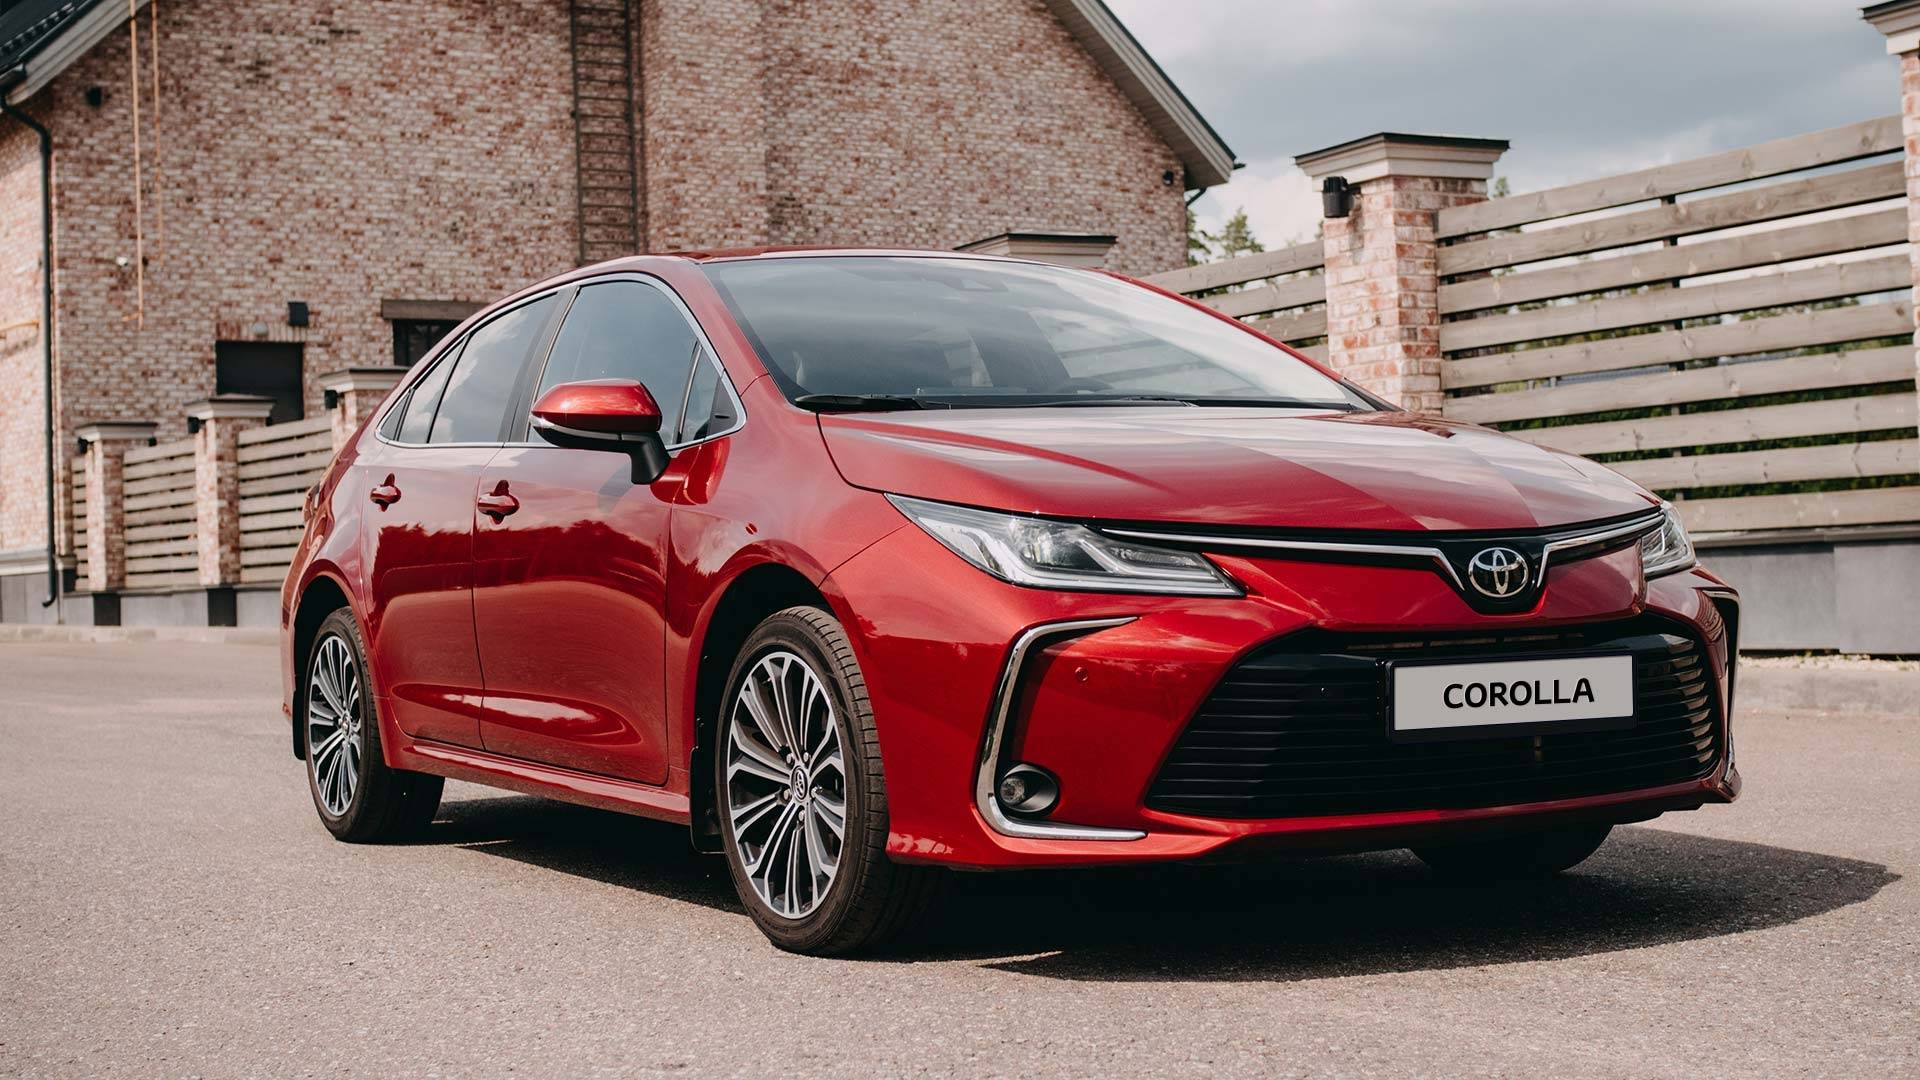 Автомобиль Тойота (Toyota) Corolla